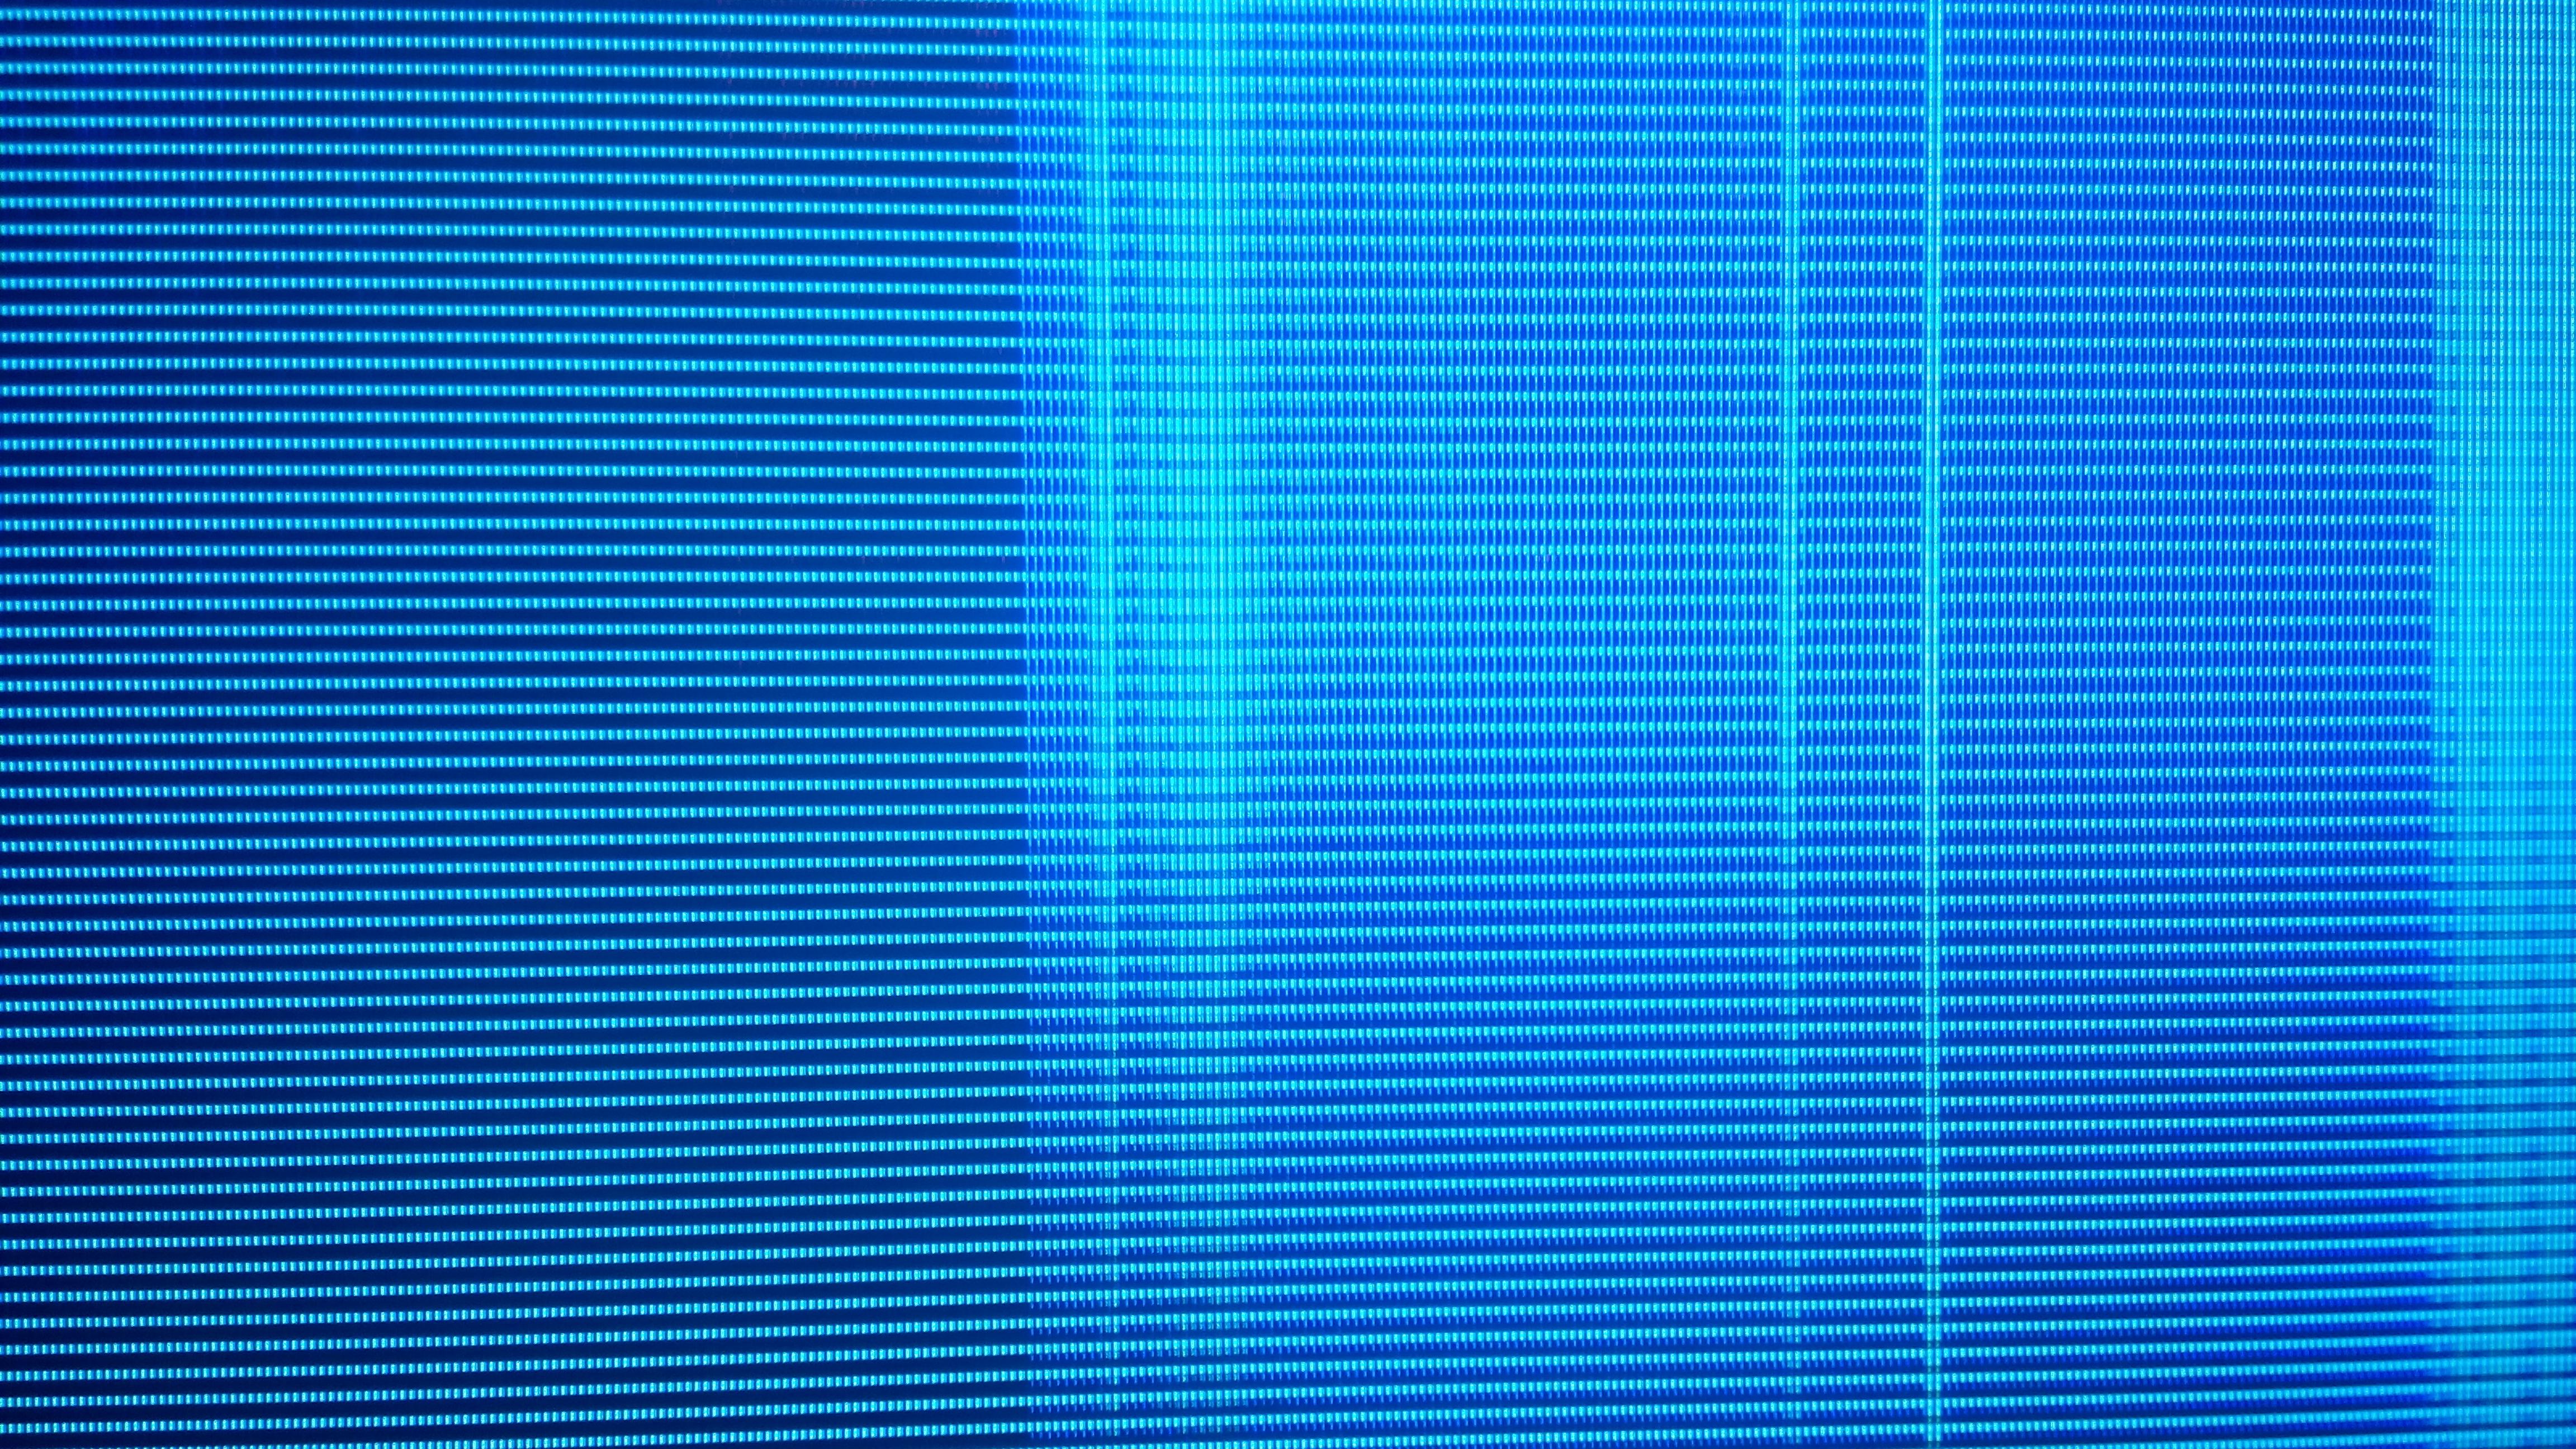 SAMSUNG le55a956d1m - poziome pasy na ca�ej d�ugo�ci ekranu